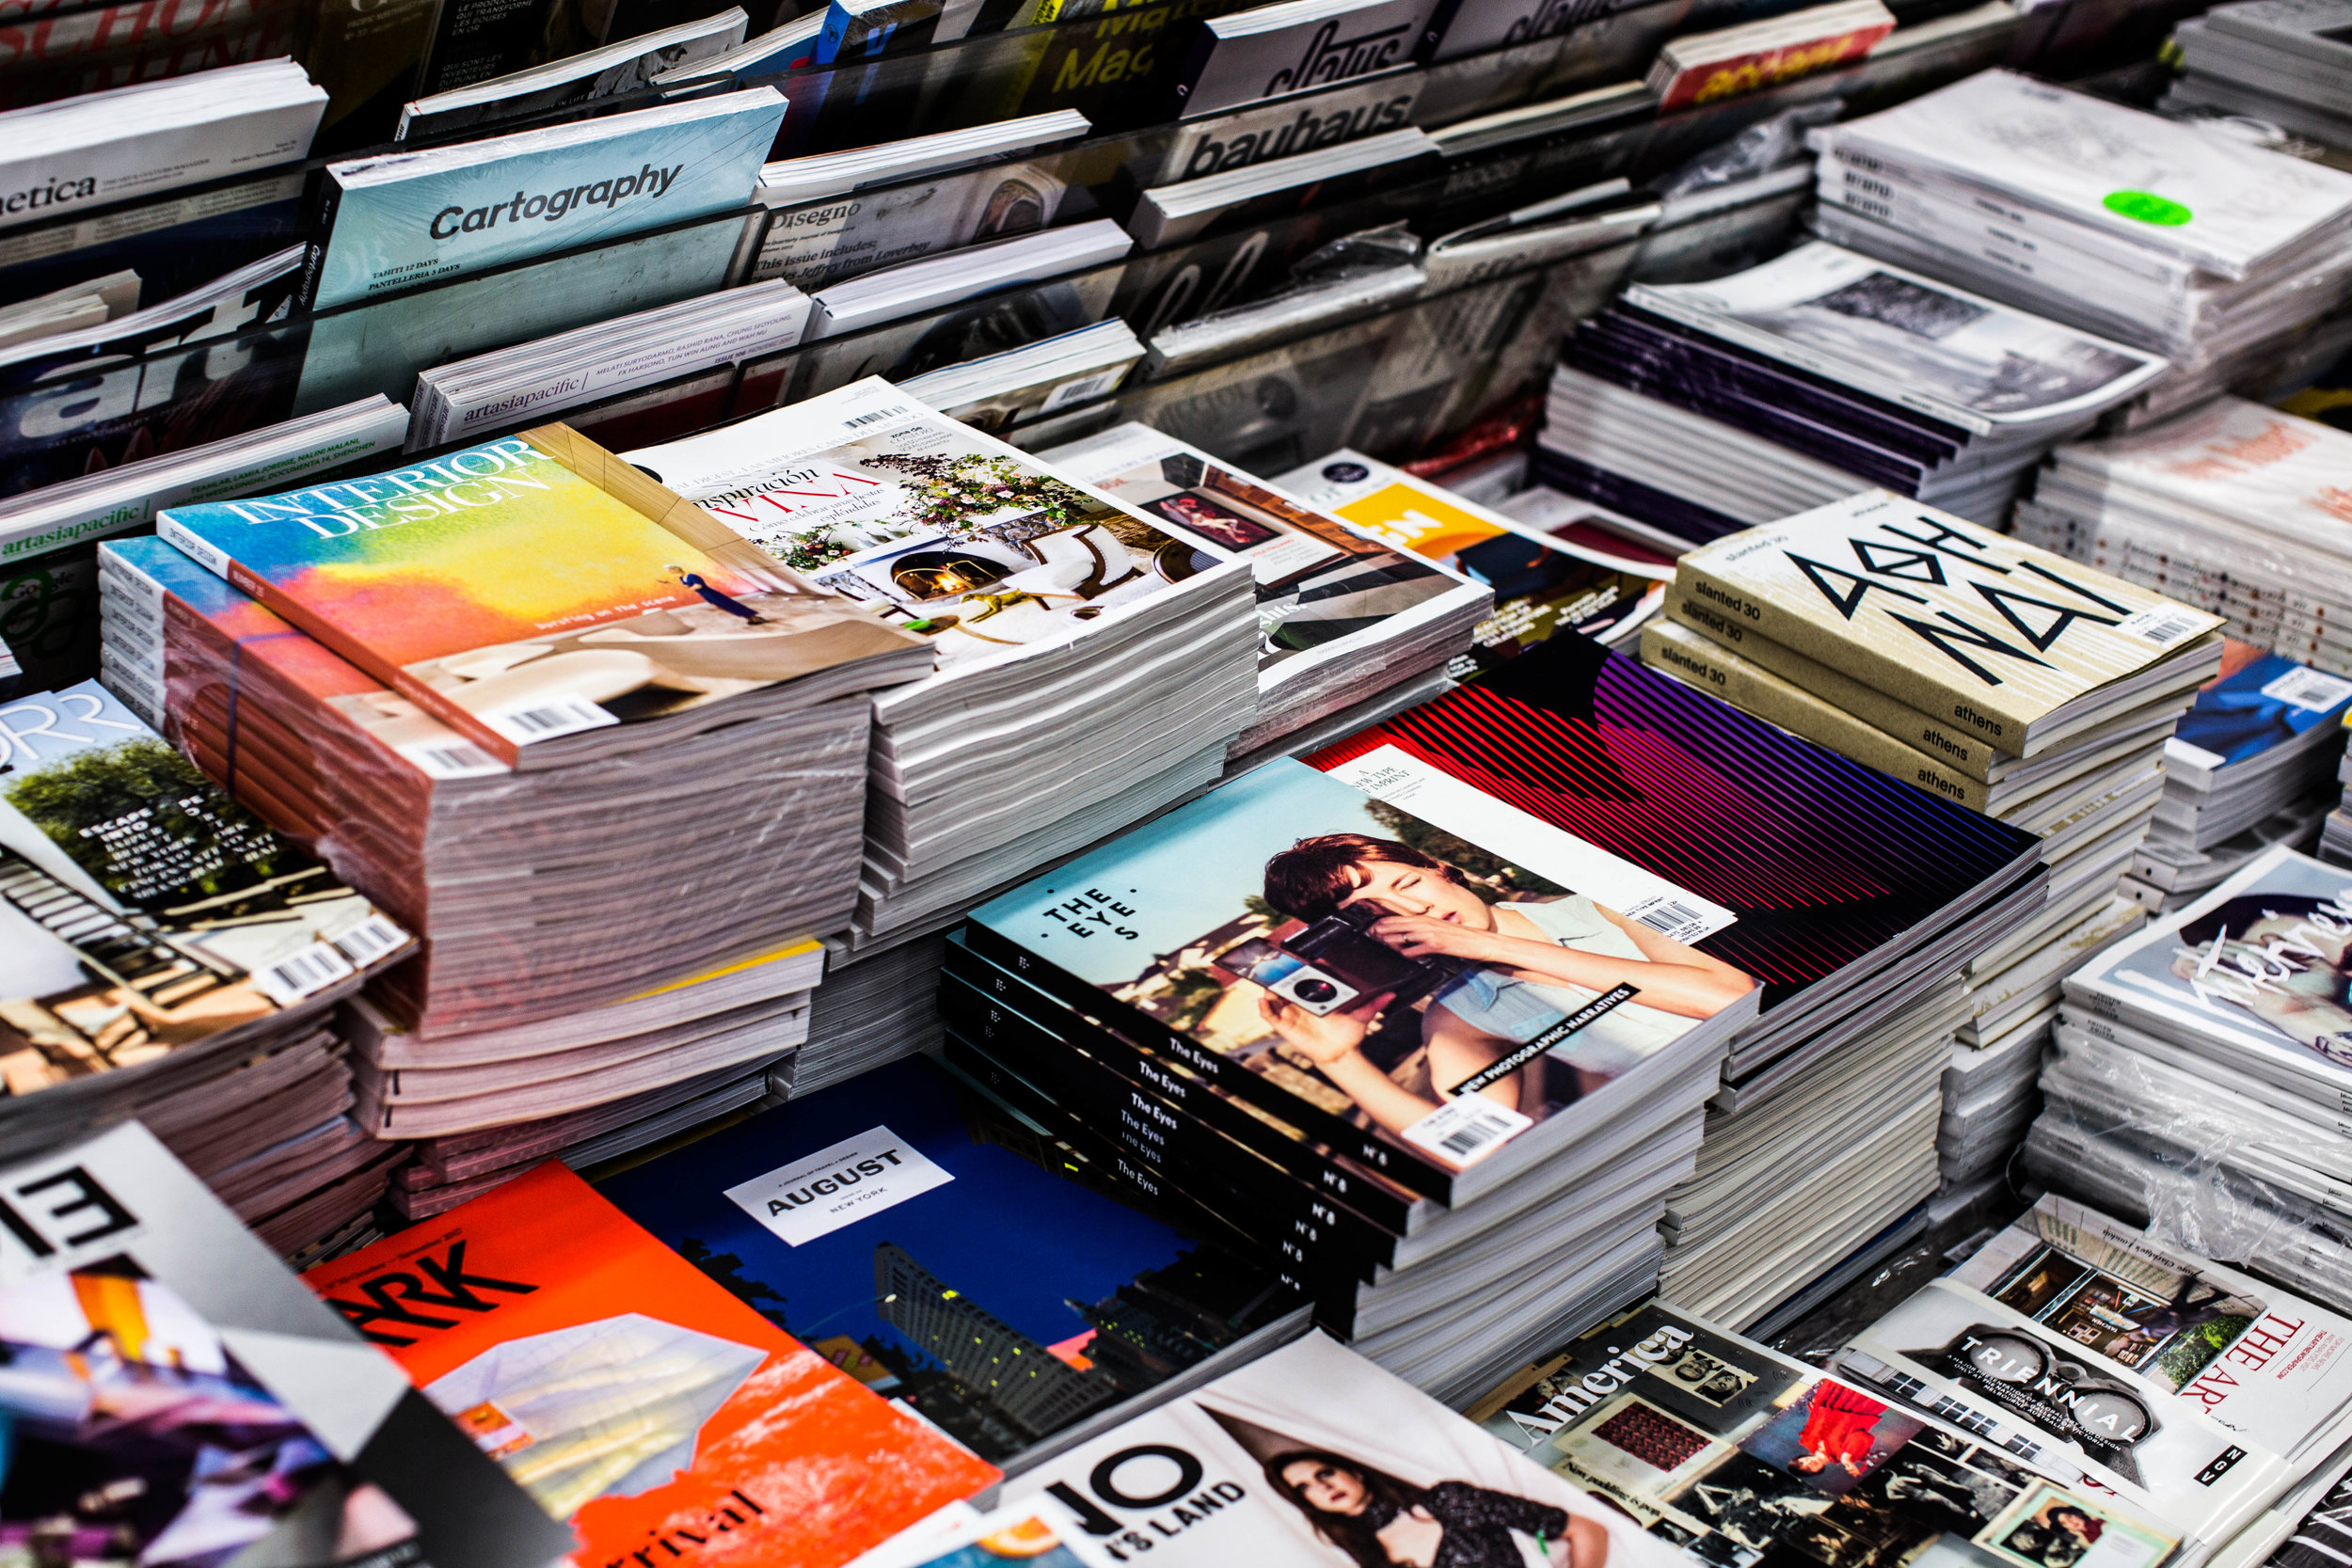 Stacks on stacks at Casa Magazines. Image unsplash.com/@charissek